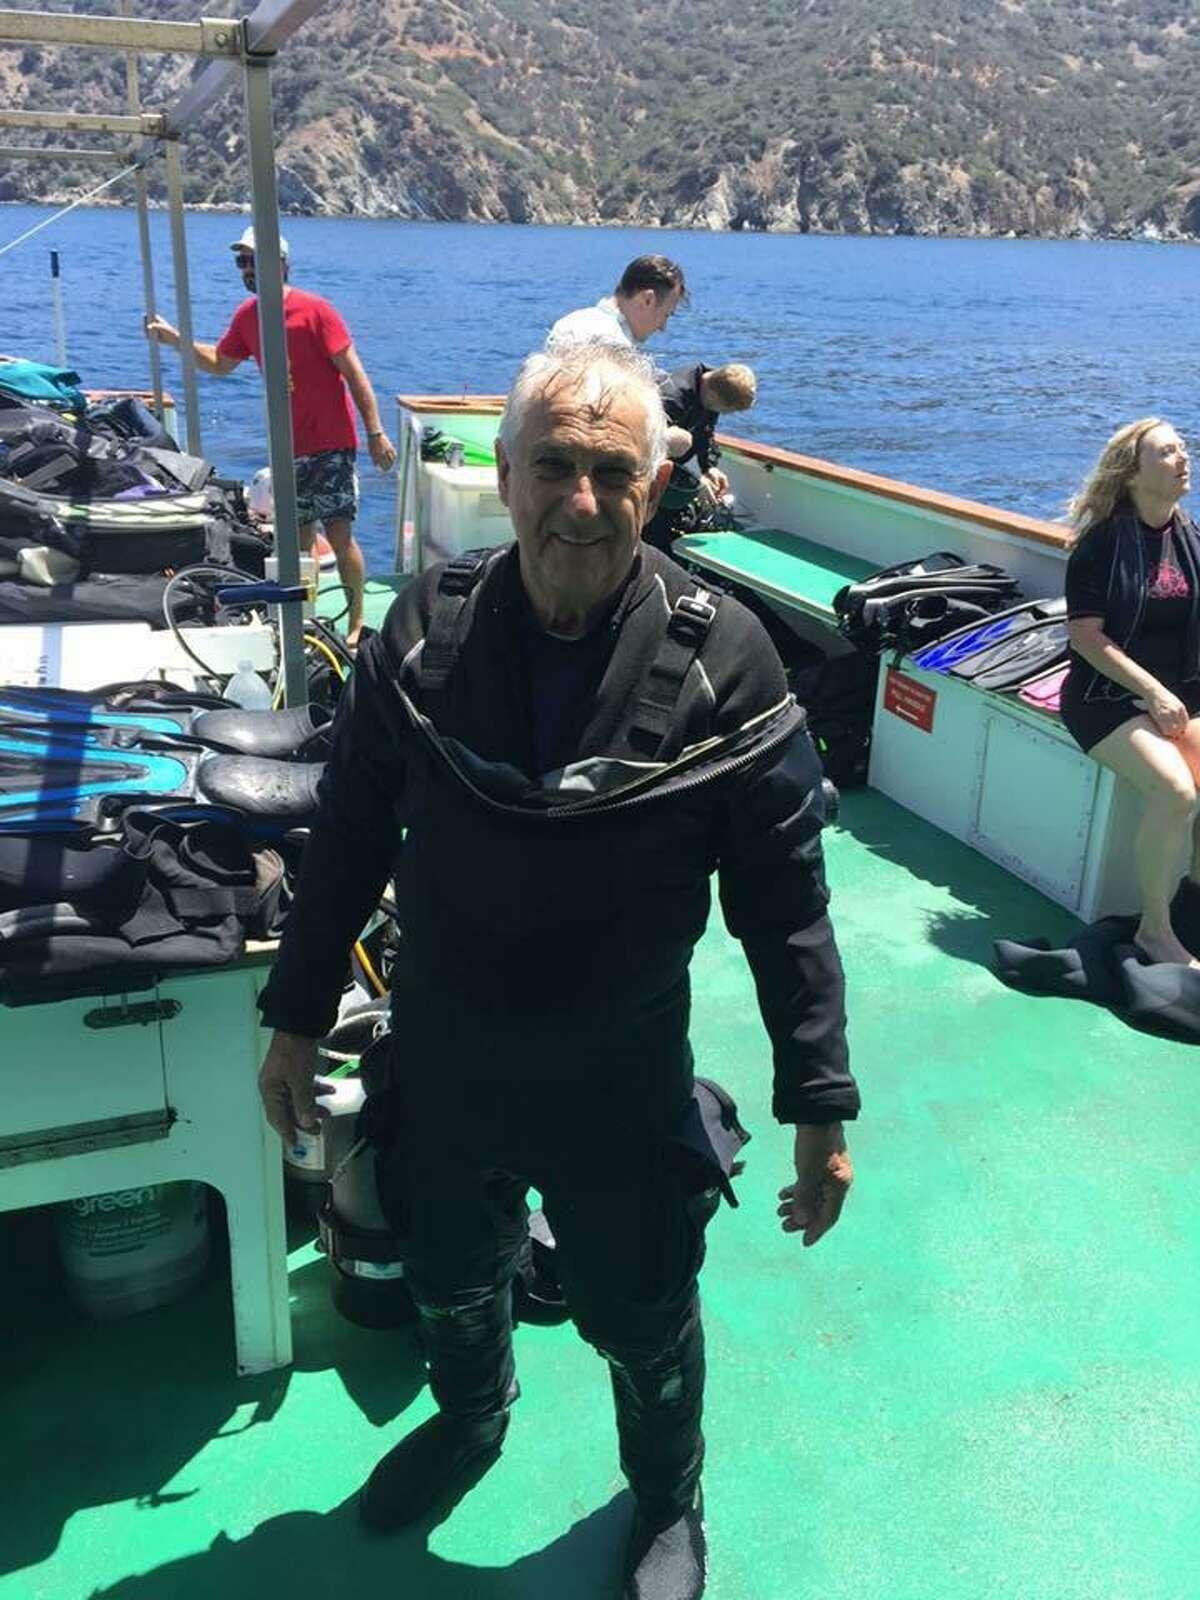 Longtime scuba diver Sal Zammitti aboard the Vision liveaboard boat in 2018.